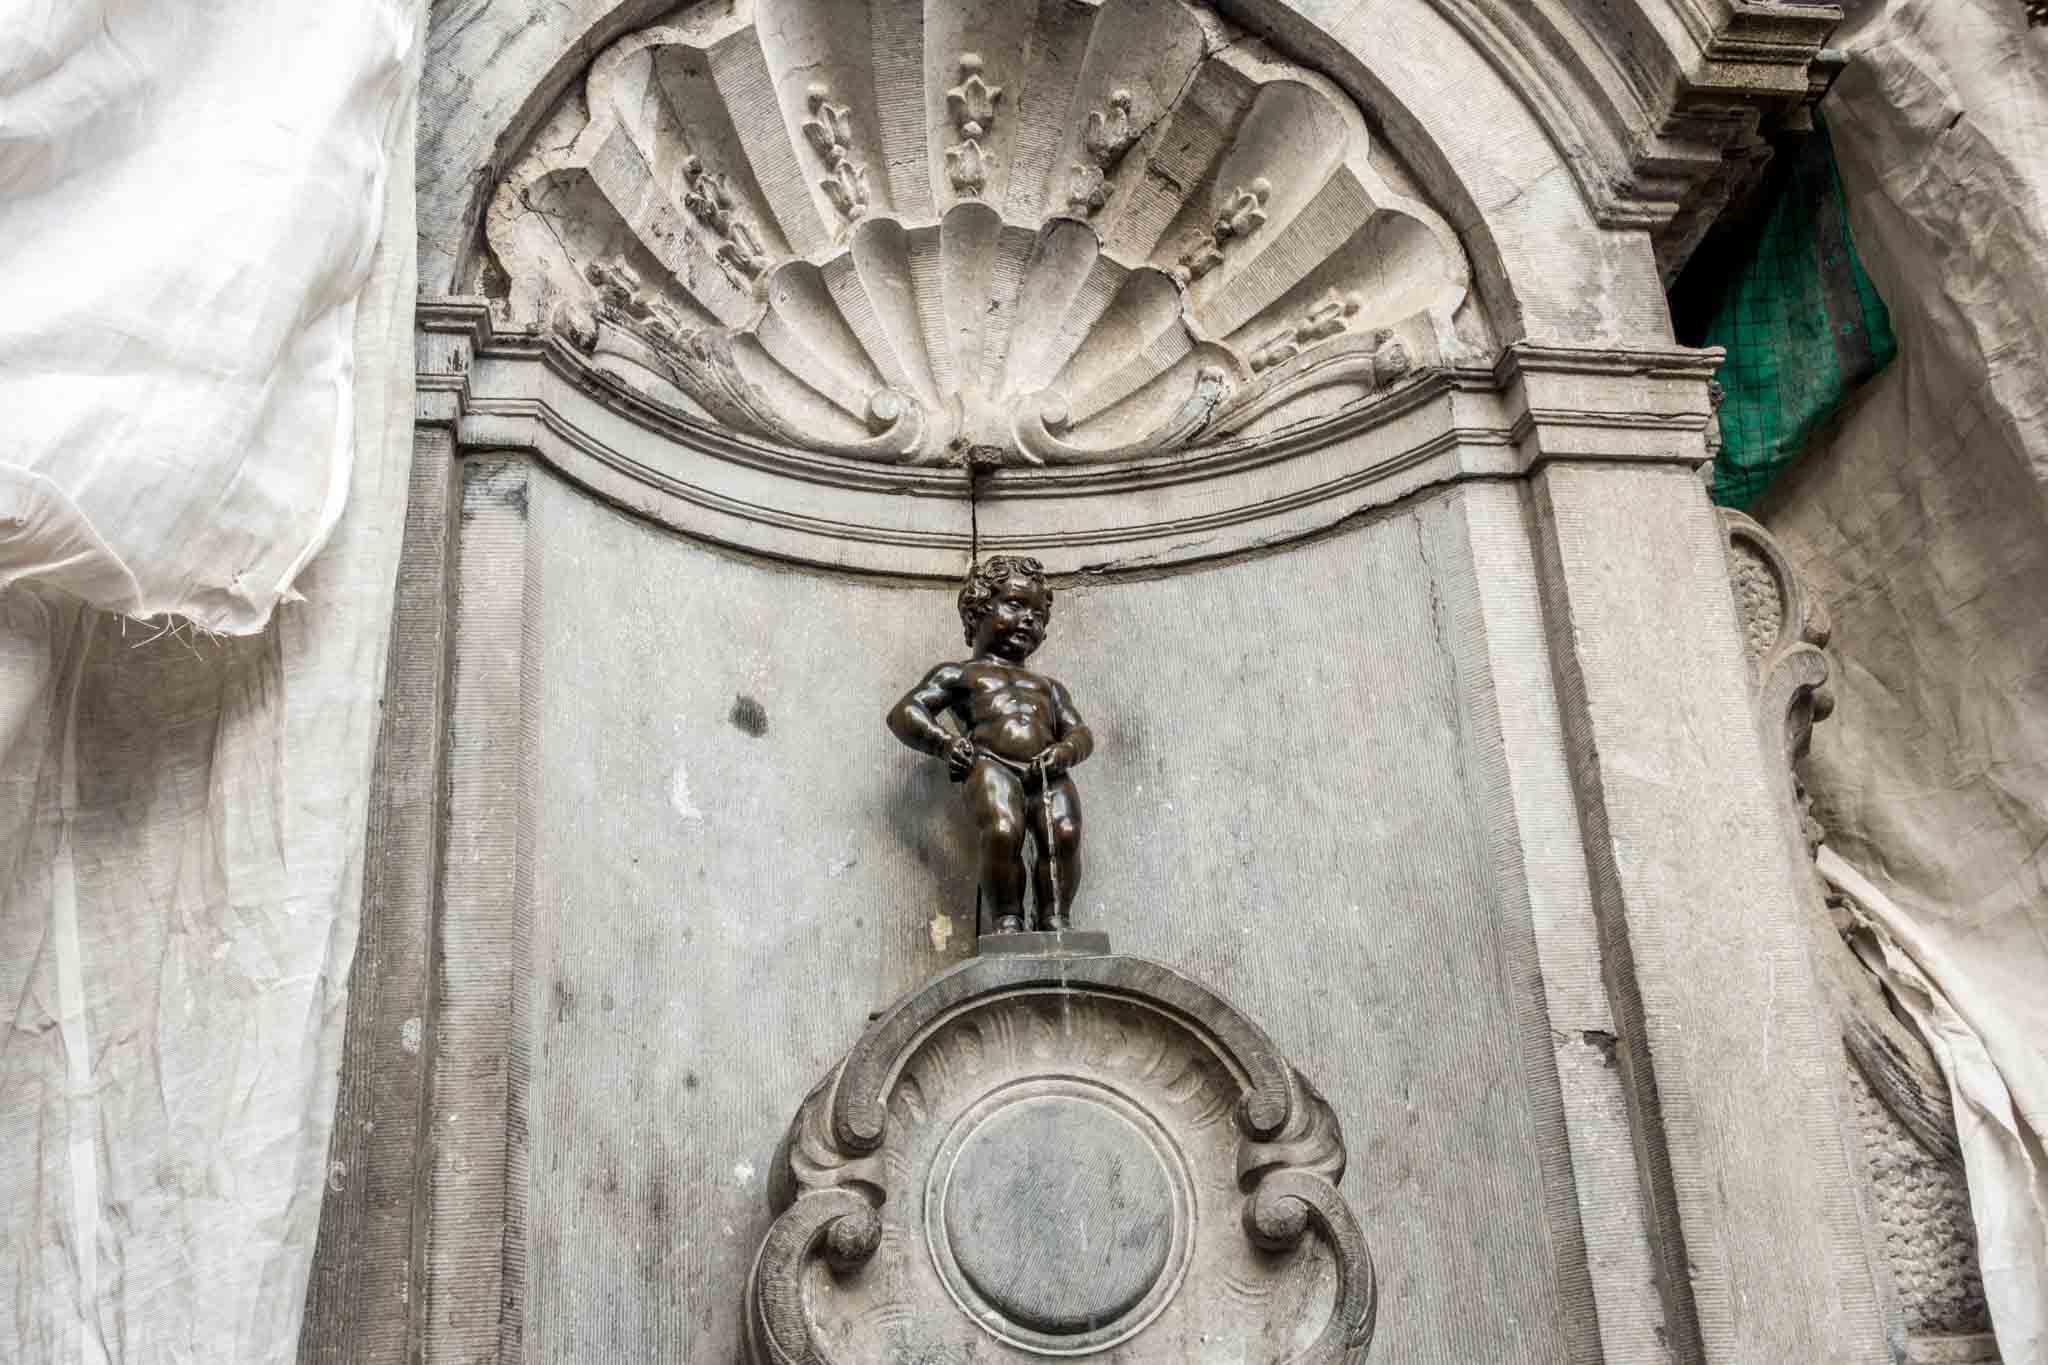 Statue of a little boy peeing